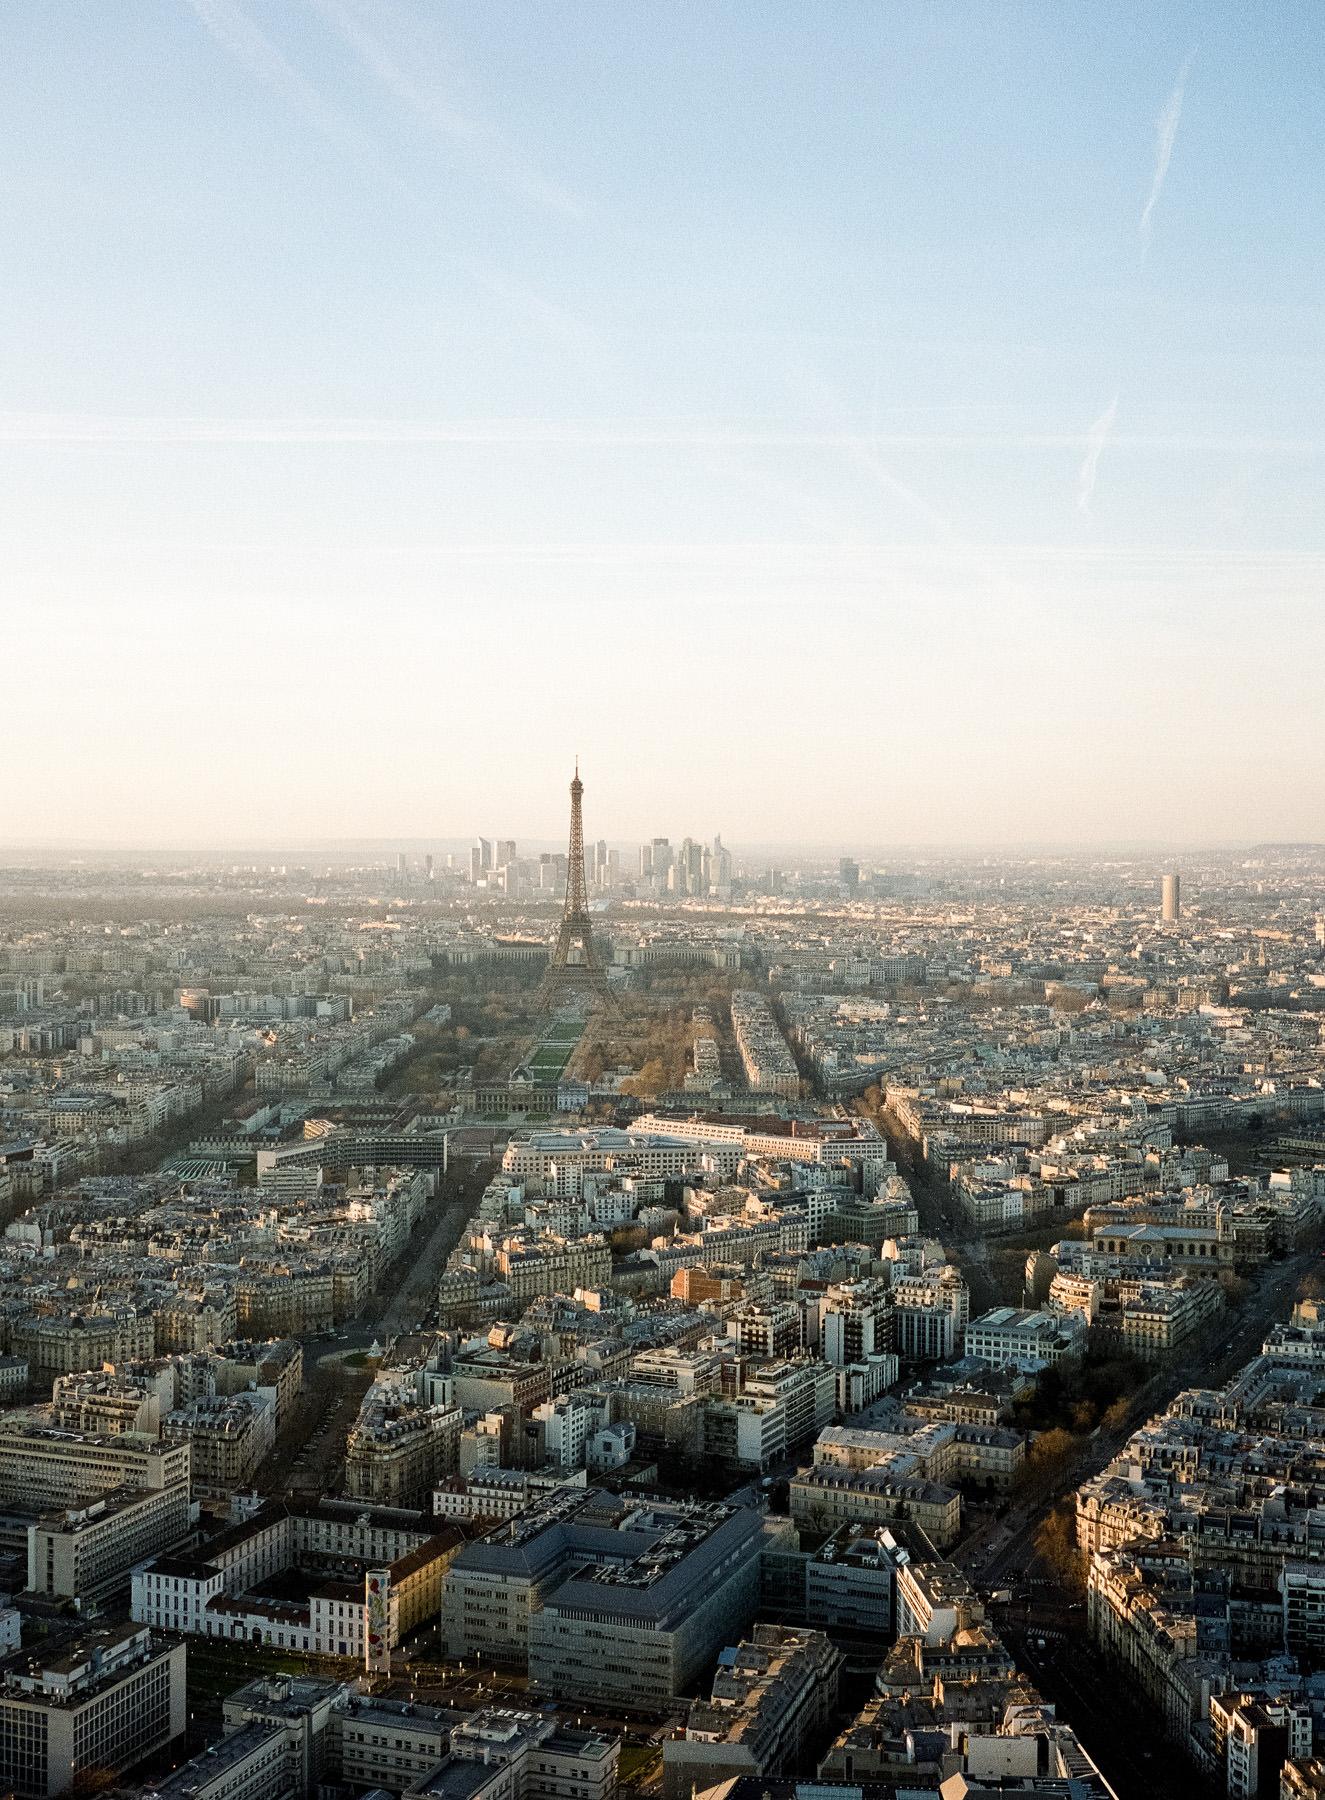 Paris depuis la tour Montparnasse, Fuji 400H + Fujifilm GA 645